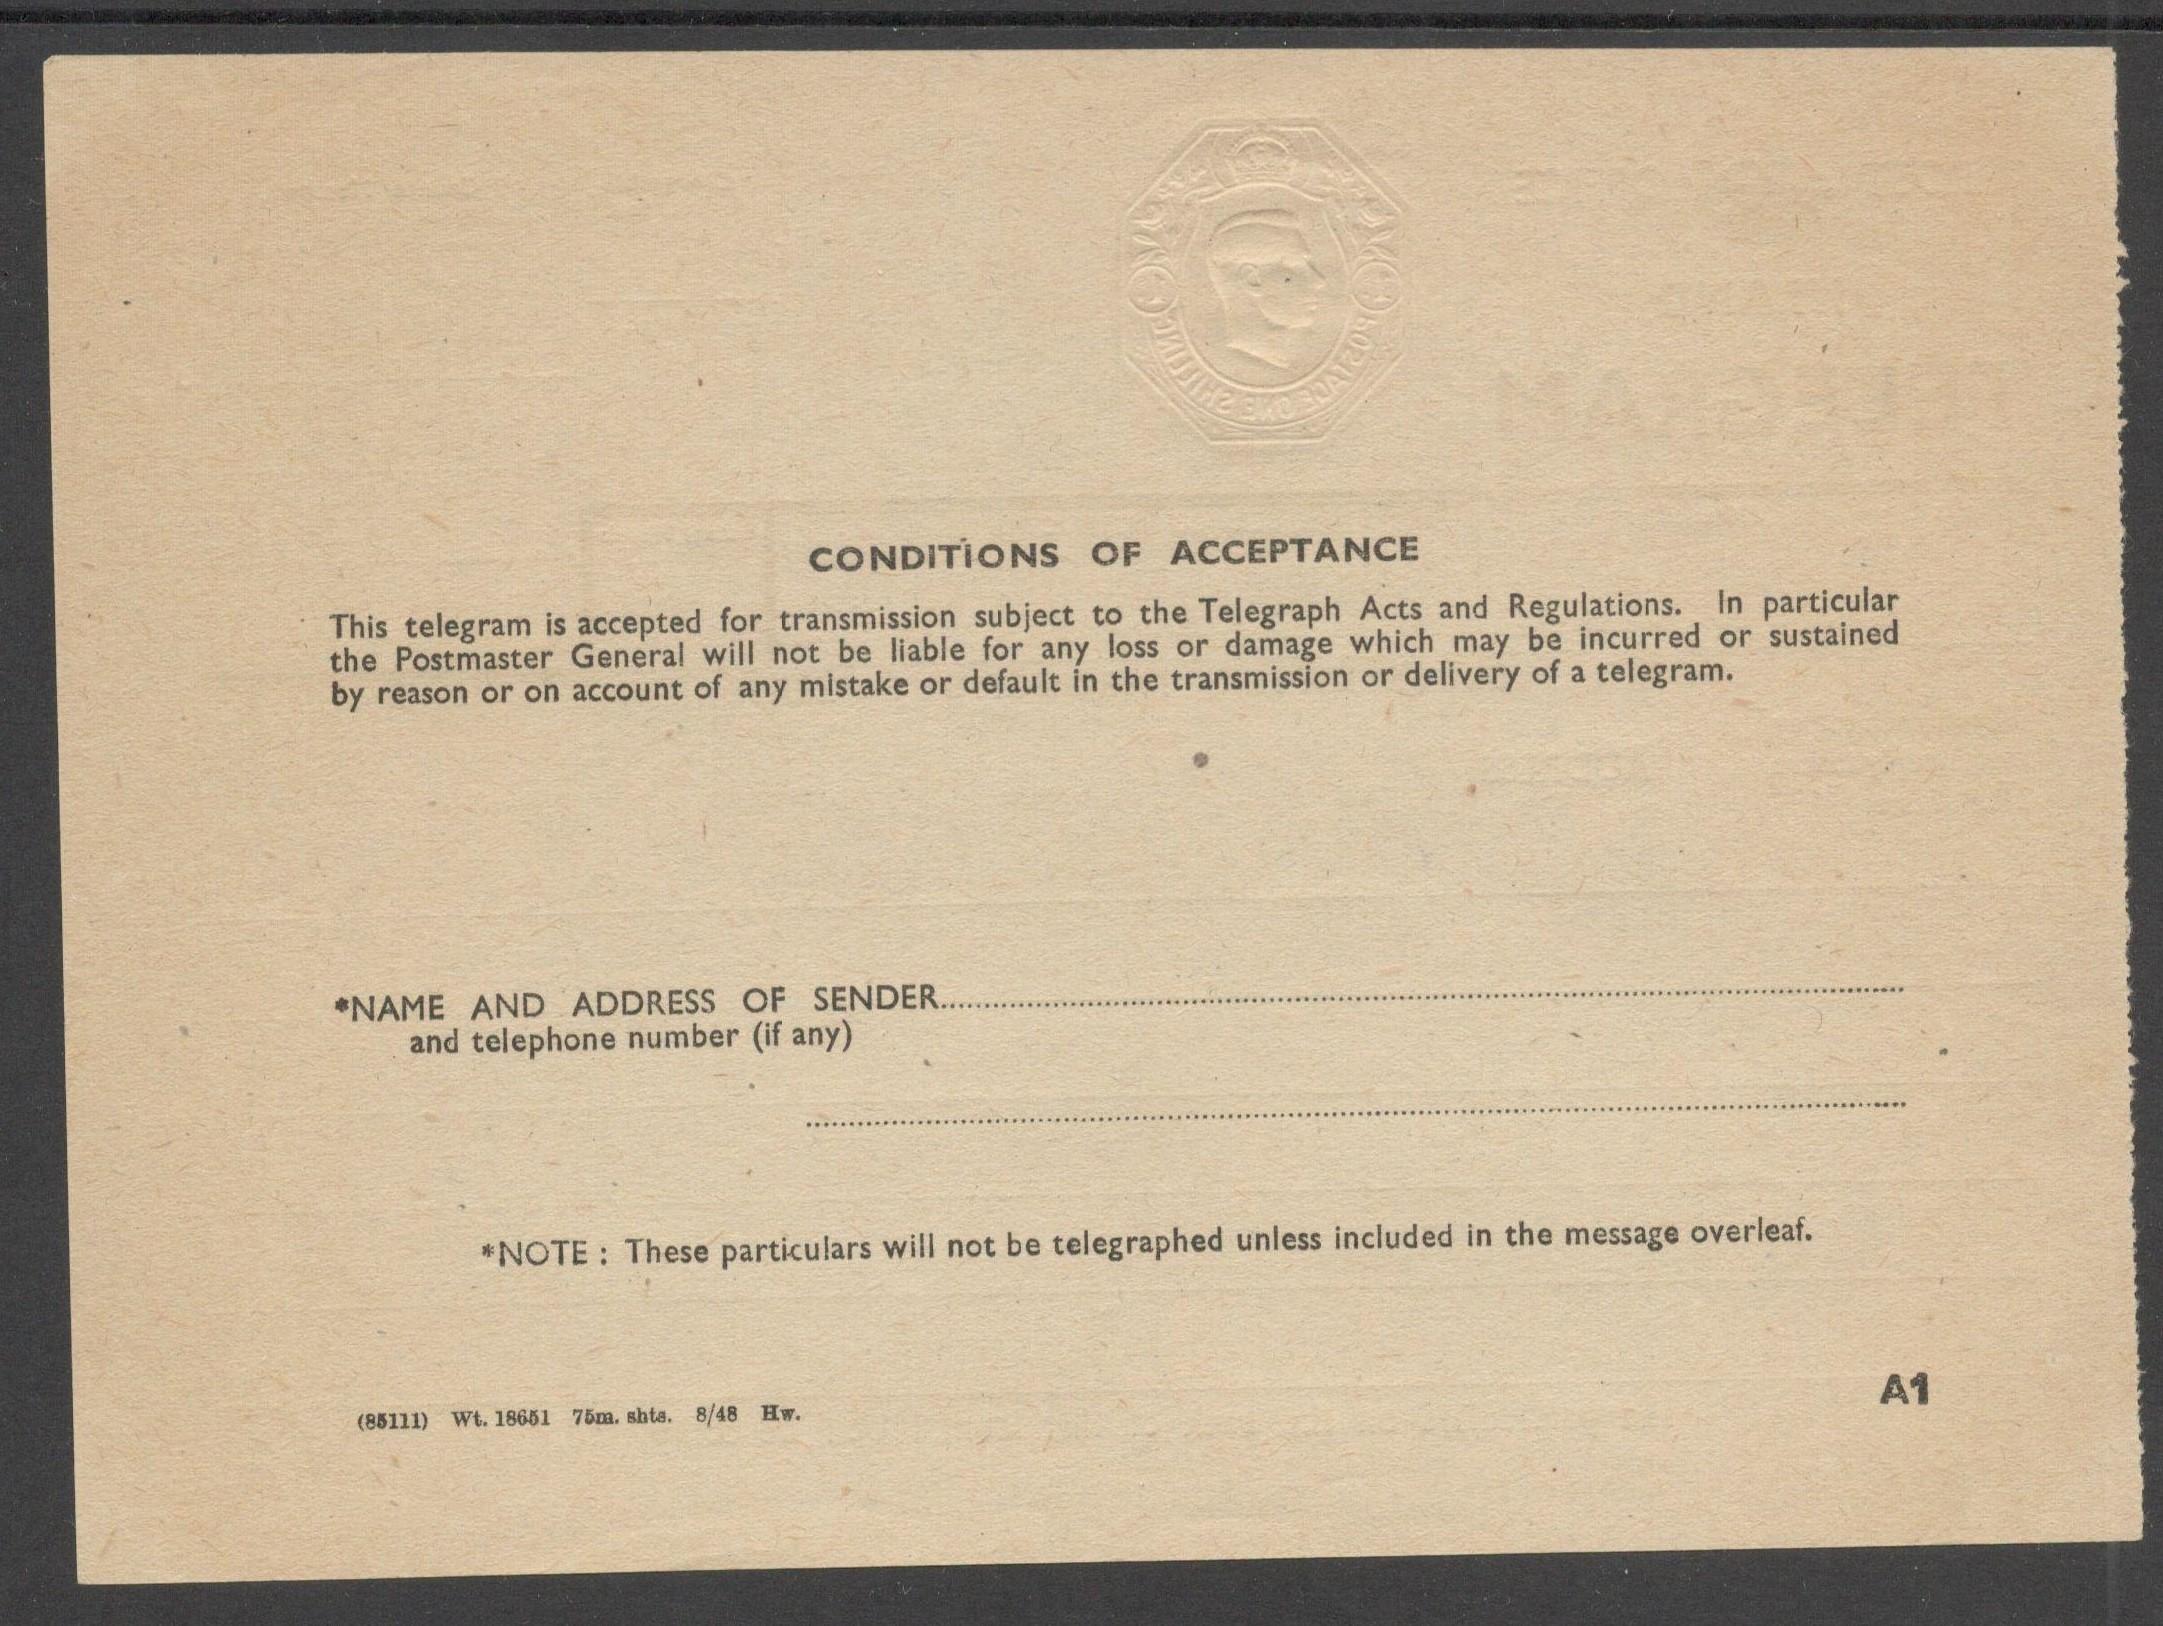 POST OFFICE INLAND TELEGRAM 1940 KGVI TELEGRAPH FORM 1 SHILLING TP28 - Image 2 of 2